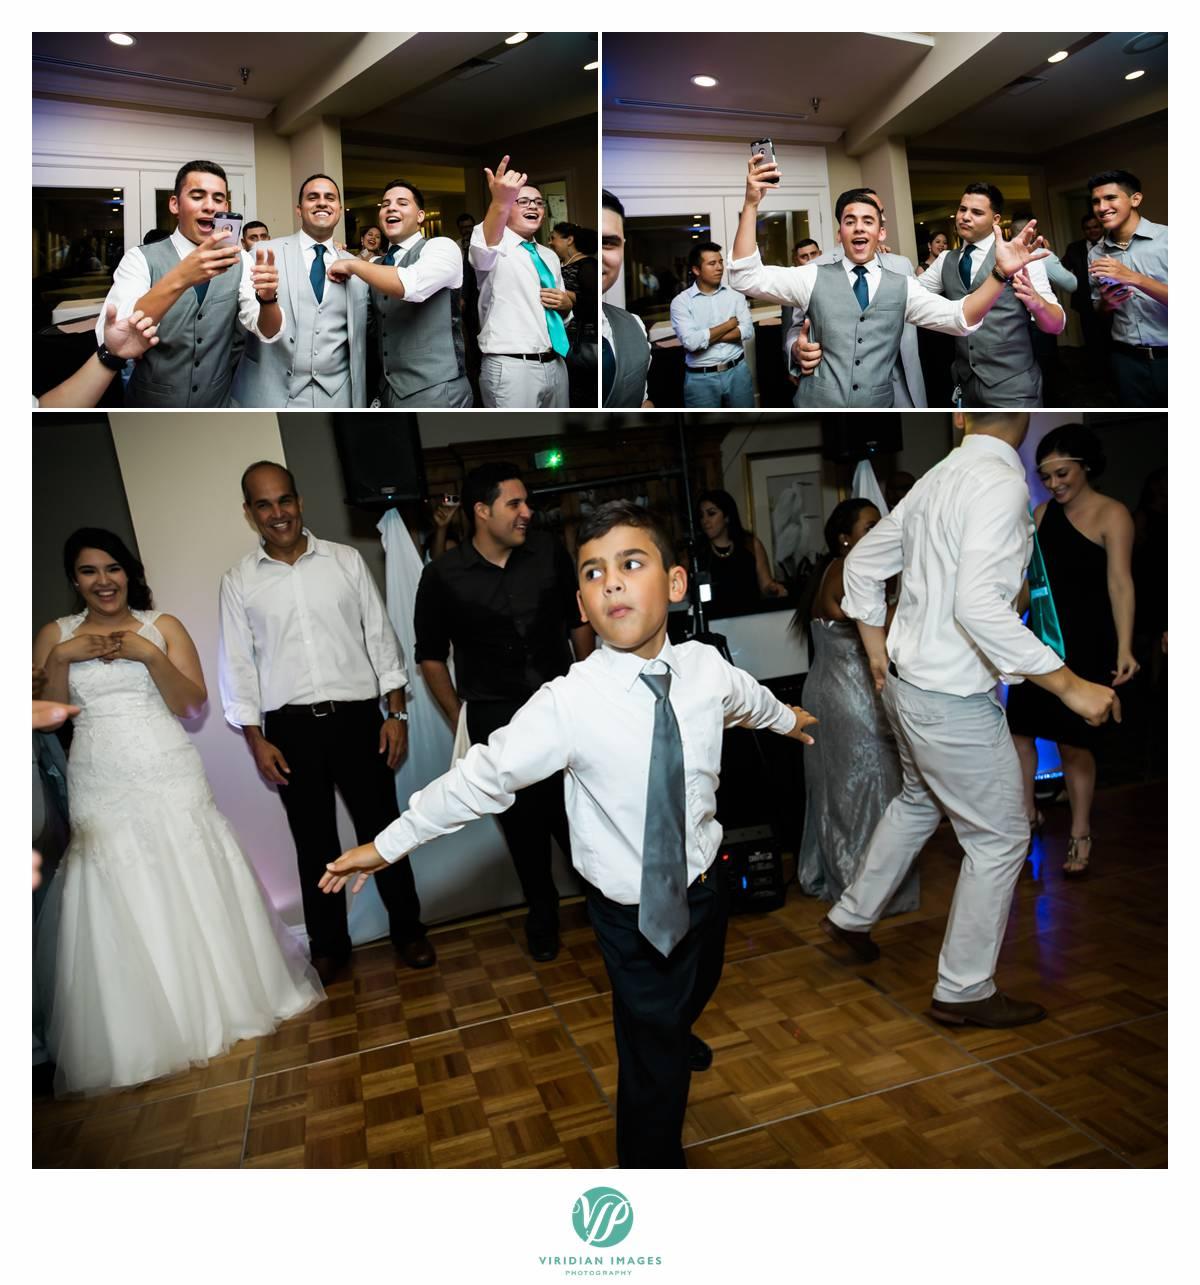 Hilton-Head-Callawassie-Club-Wedding-Viridian-Images-Photography-photo 35